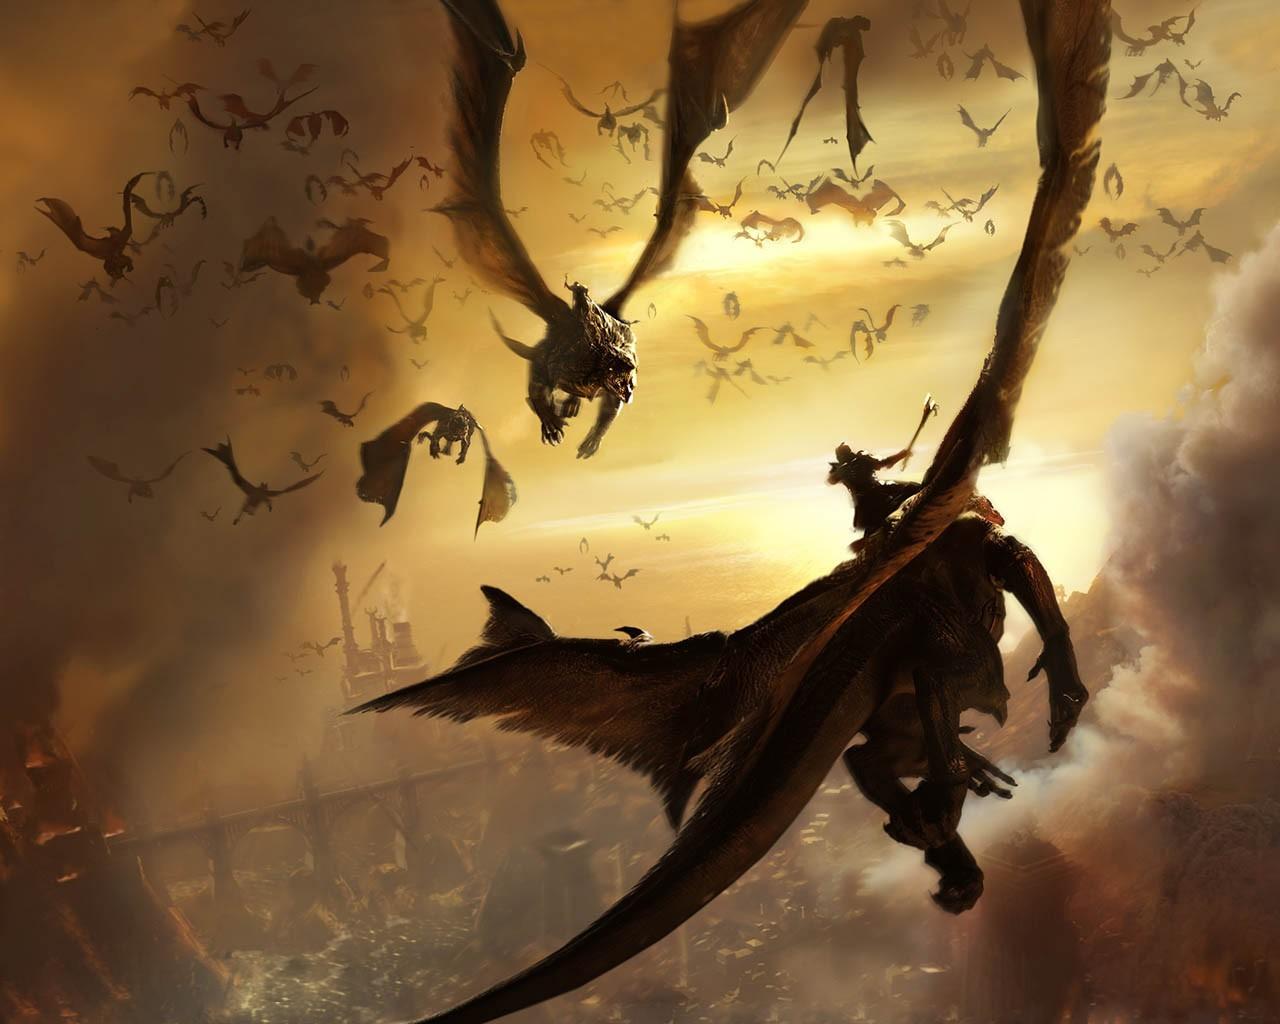 Wallpaper Illustration Flying Dragon Mythology